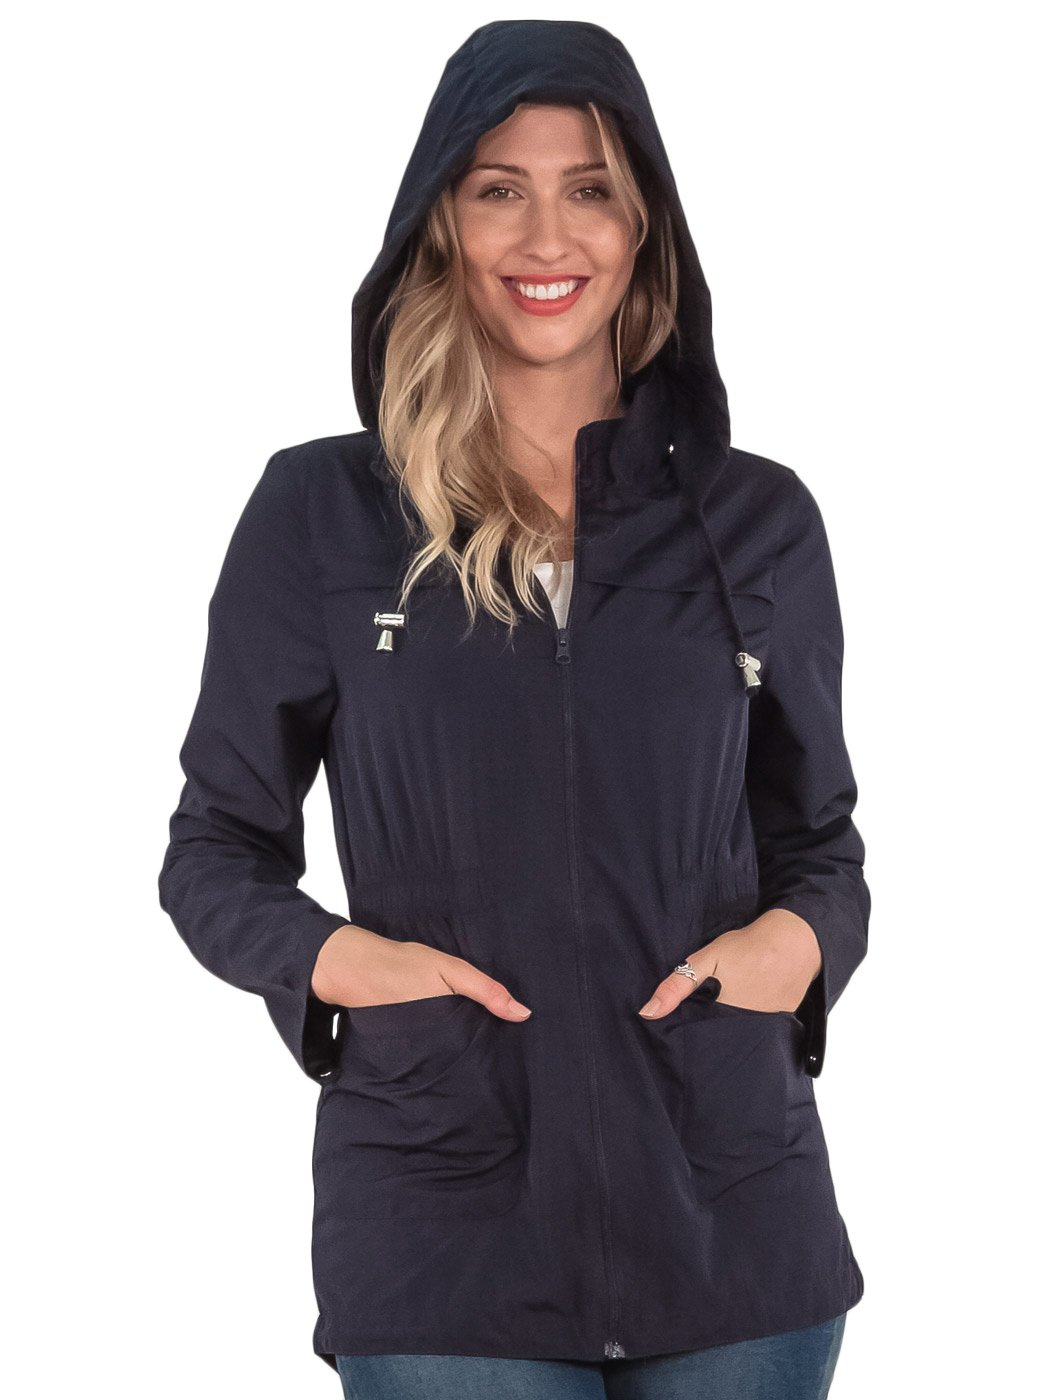 Womens RainCoat Plain Hooded Ladies Jacket Kagool Parka Long Sleeves Two Pockets